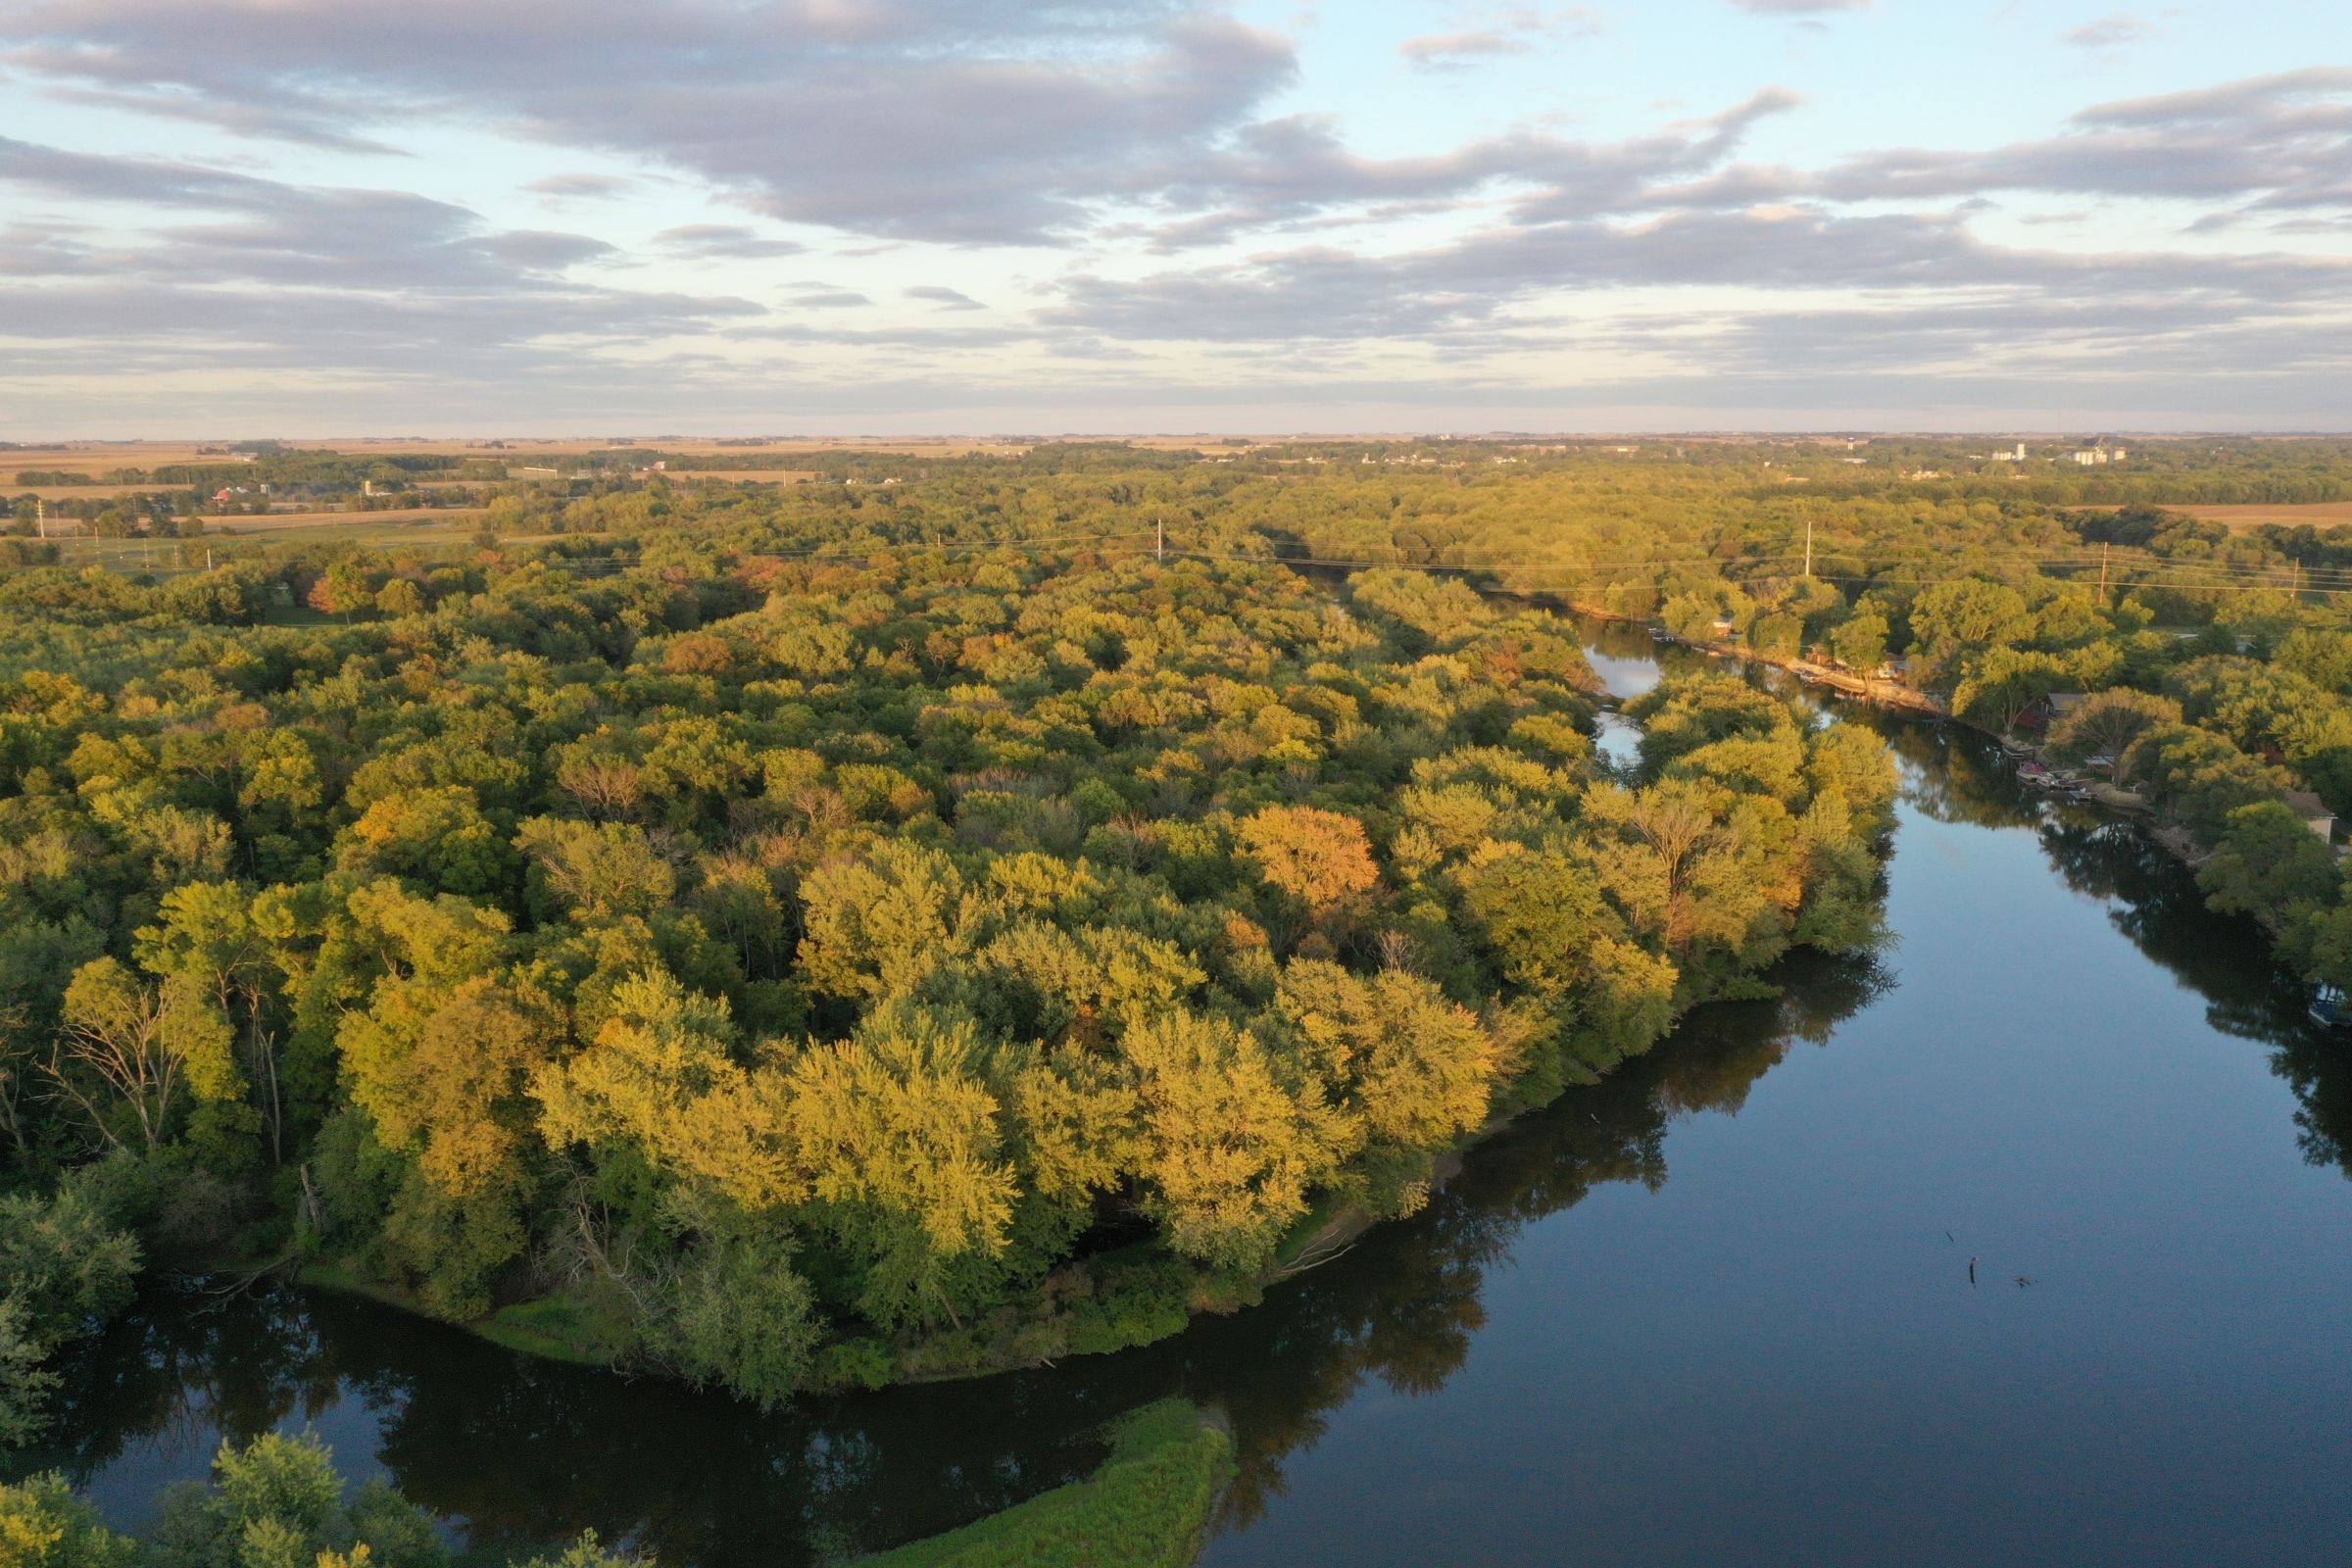 land-buchanan-county-iowa-33-acres-listing-number-14906-1-2020-10-28-160436.JPG